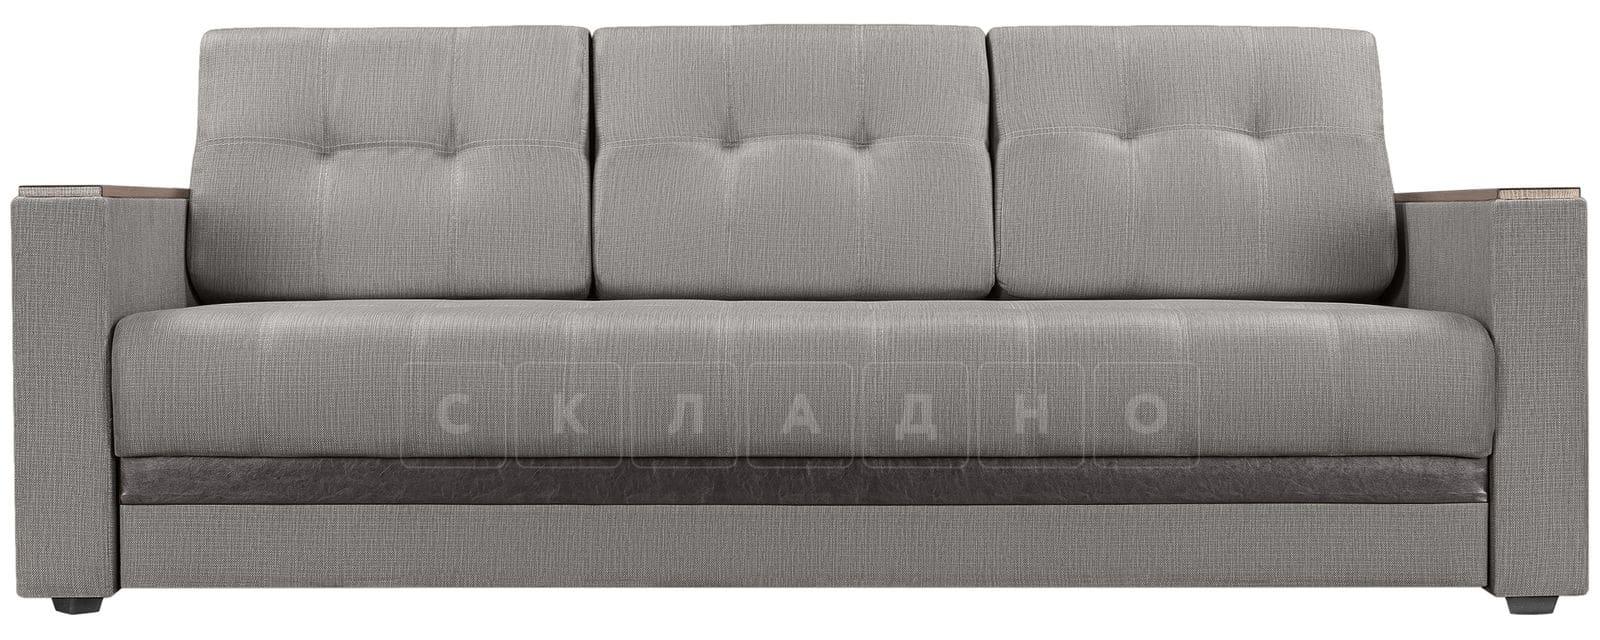 Диван Атланта рогожка серого цвета фото 2 | интернет-магазин Складно